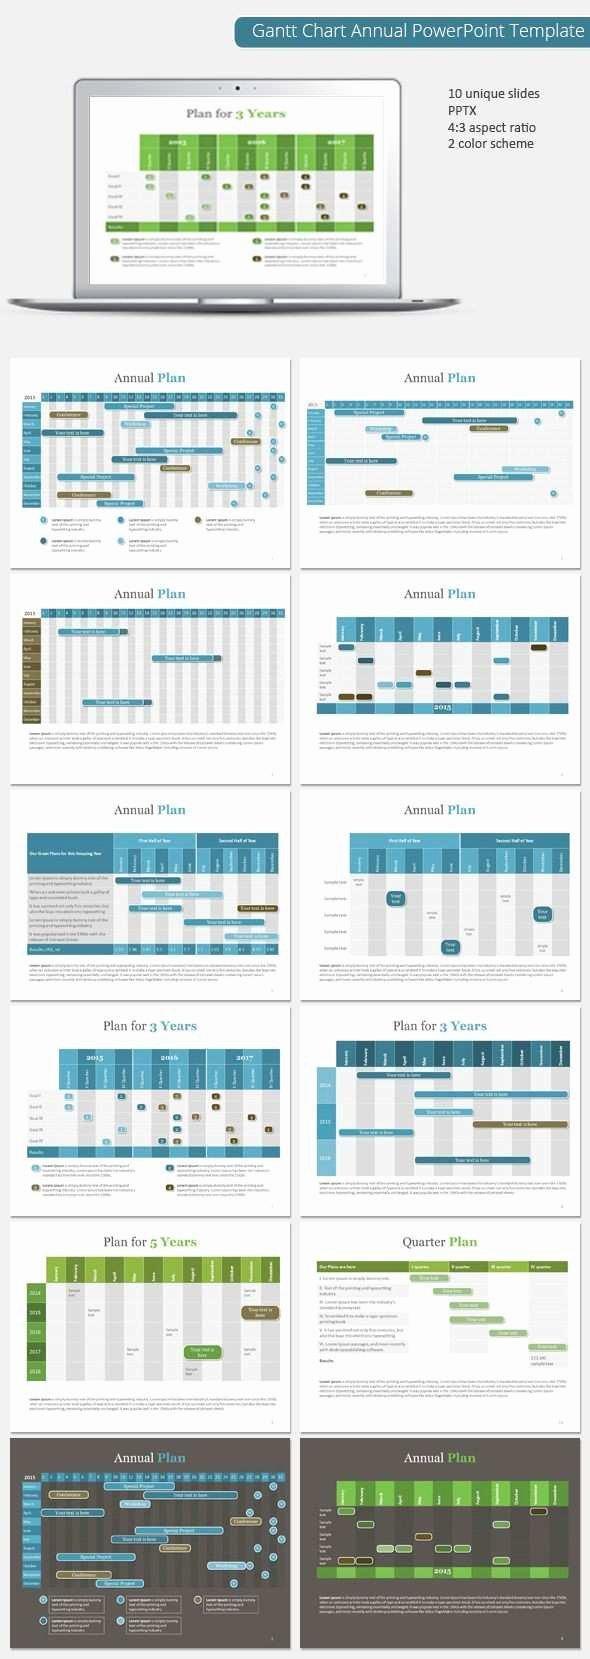 Product Roadmap Template Excel Elegant Elegant Microsoft Excel Product Roadmap Template